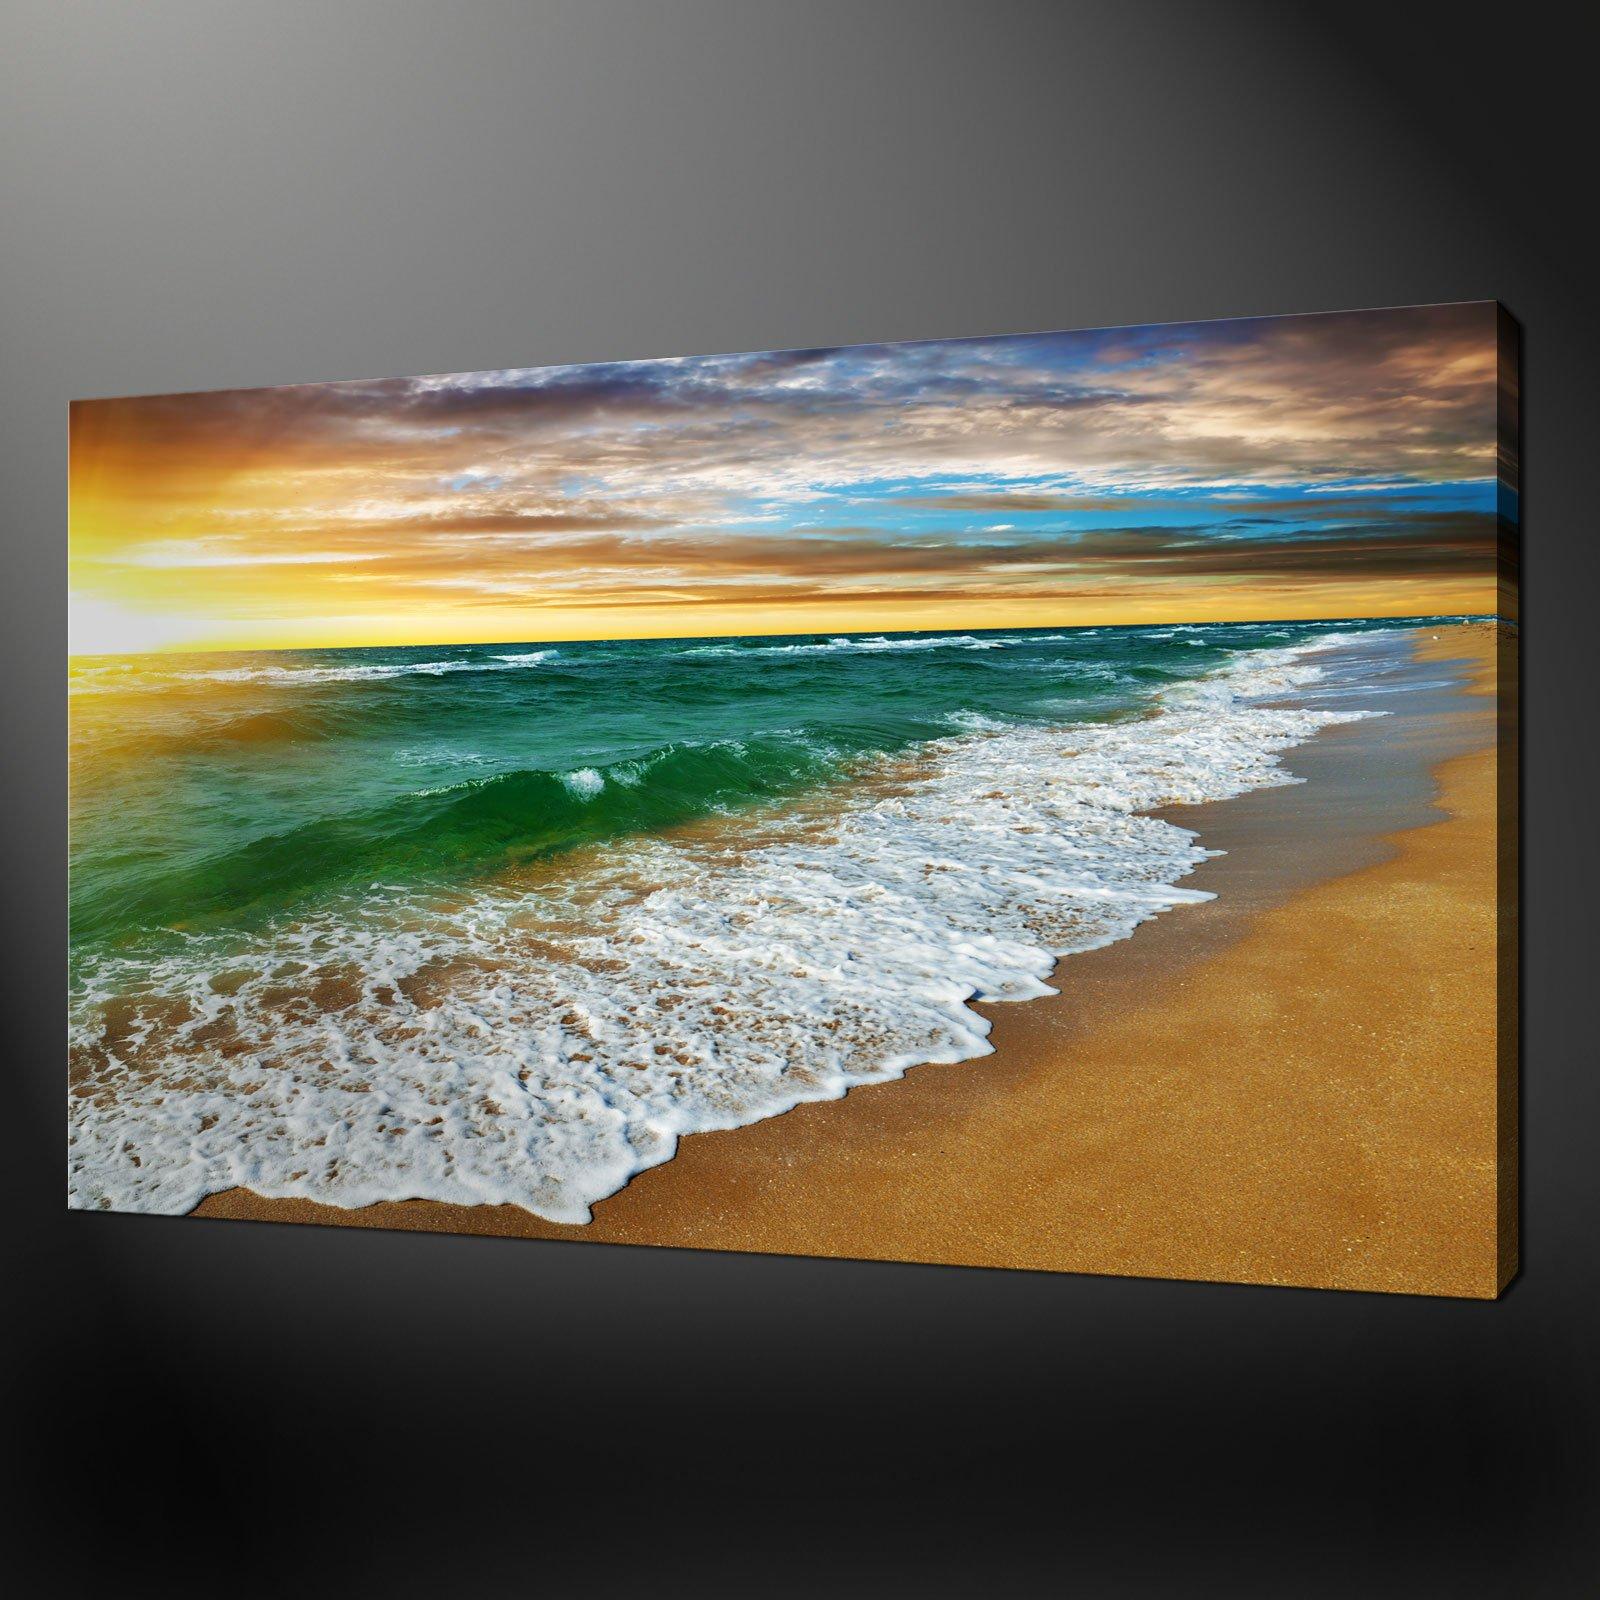 Sandy Beach: Canvas Print Pictures. High Quality, Handmade, Free Next